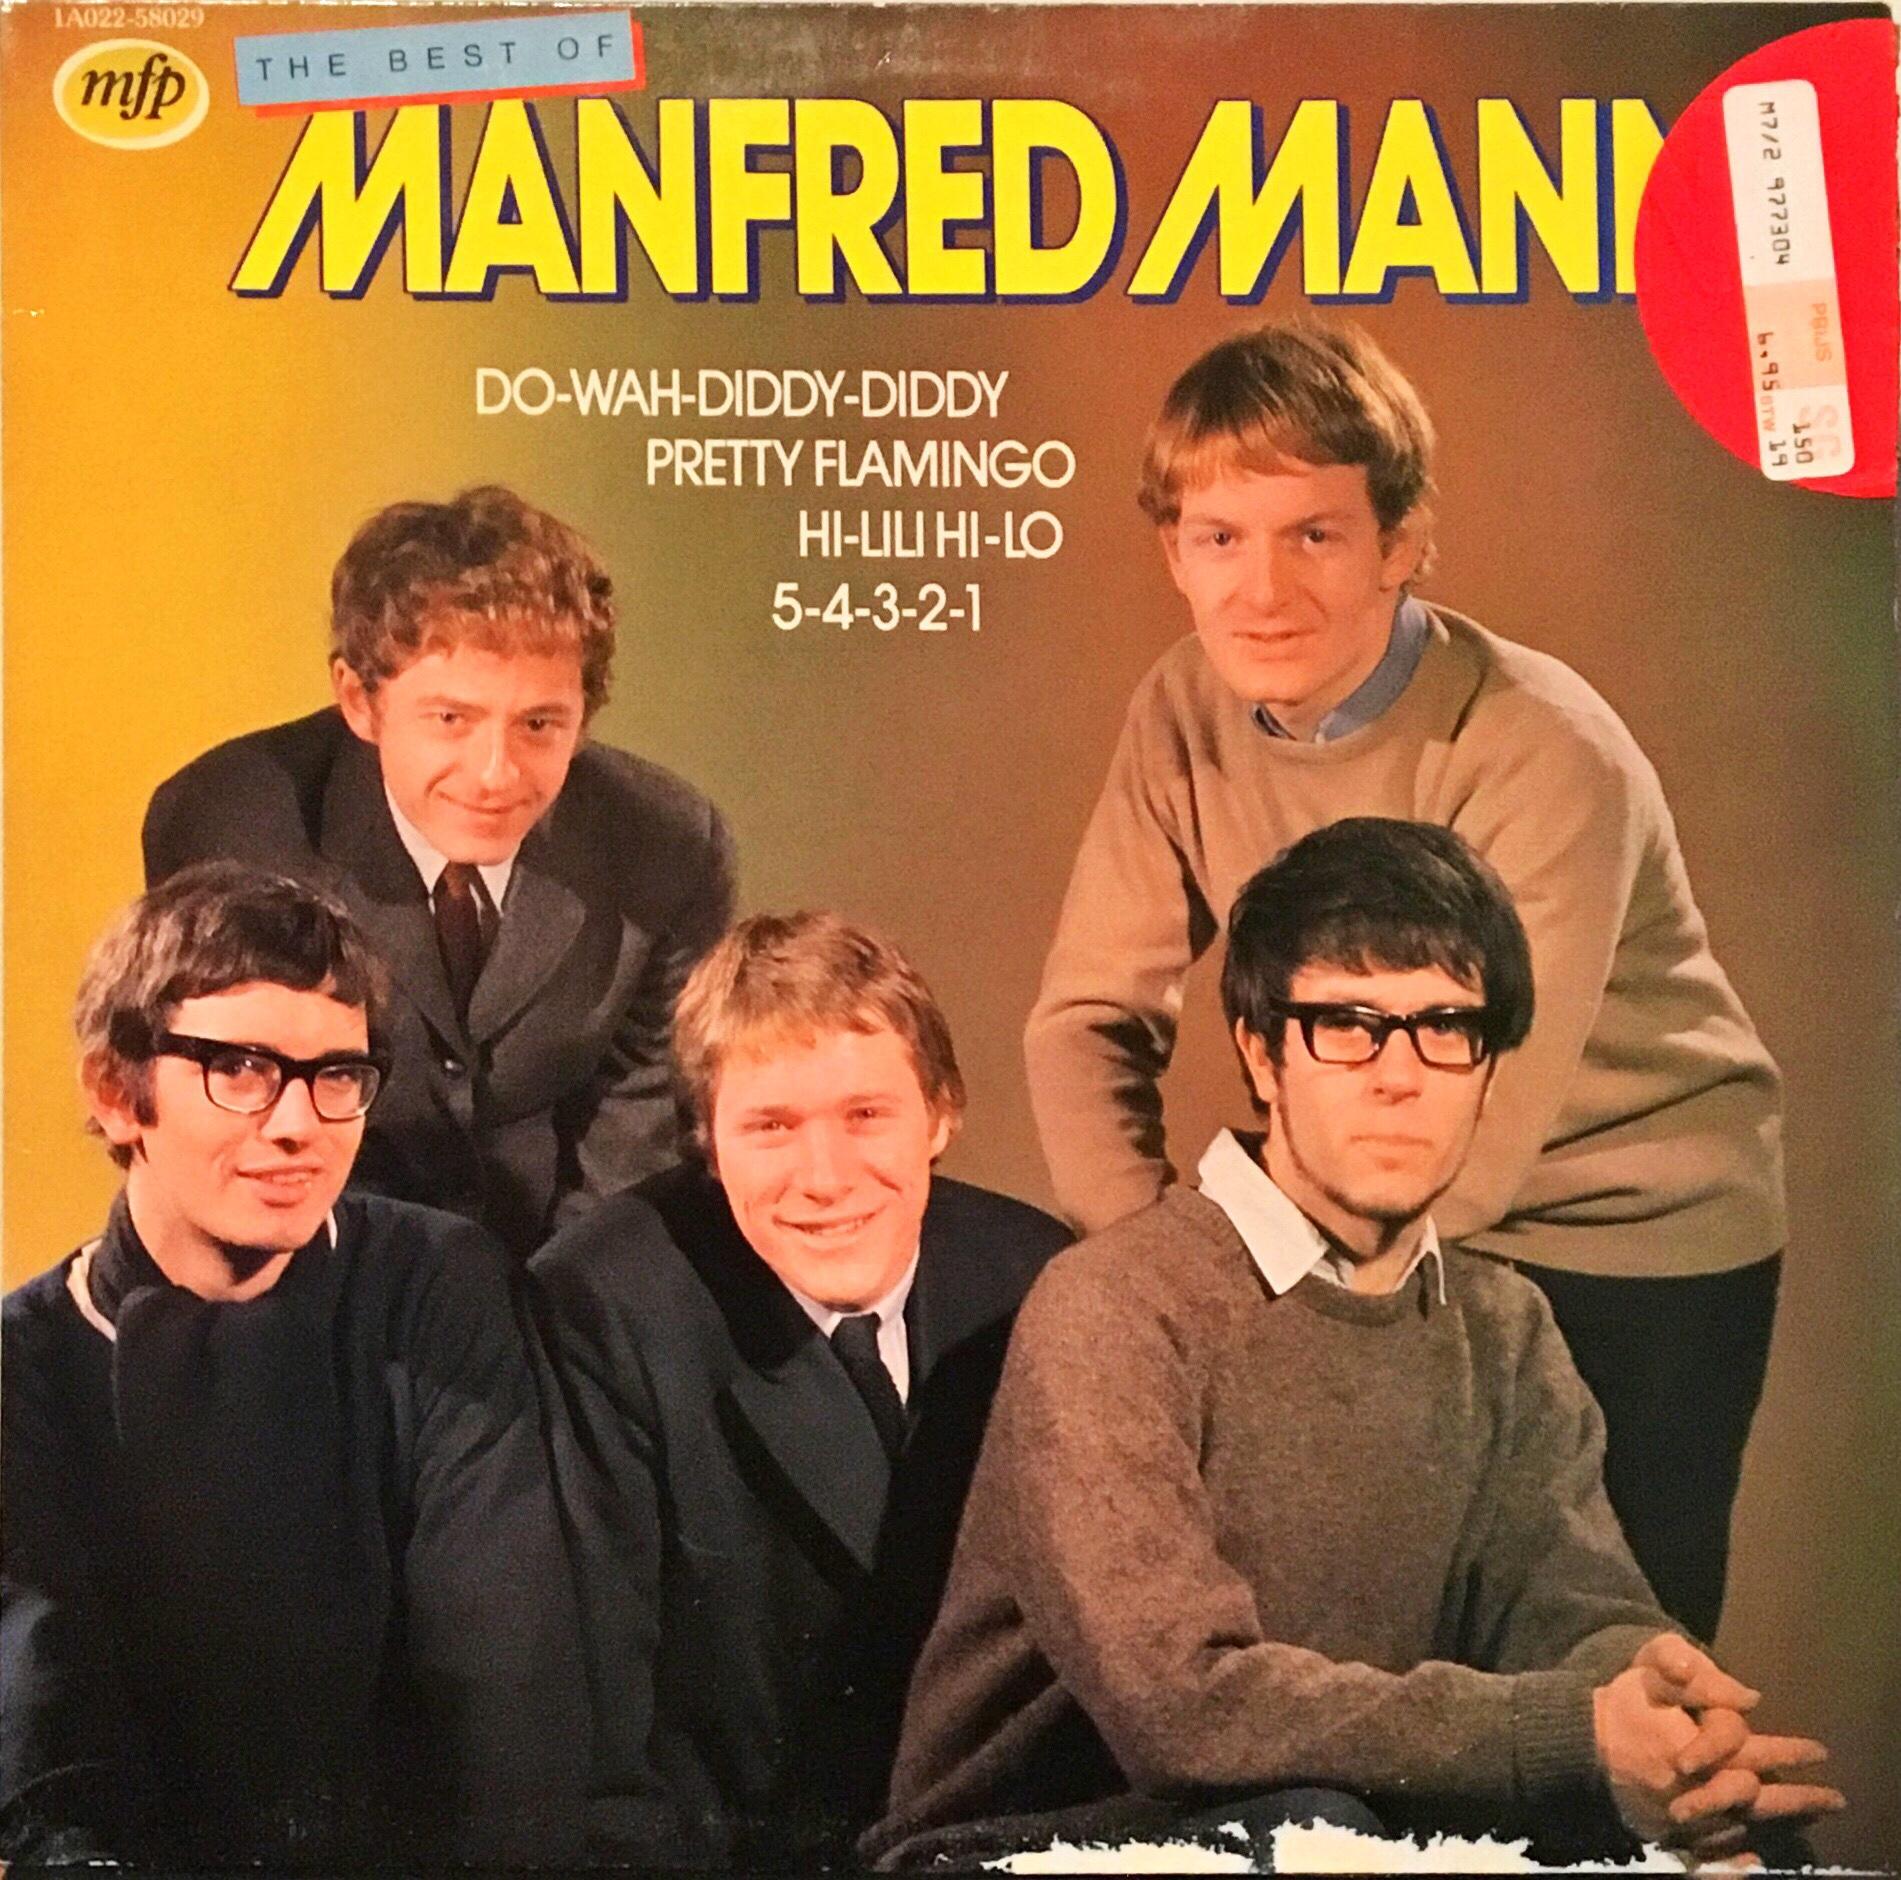 Manfred mann tour dates